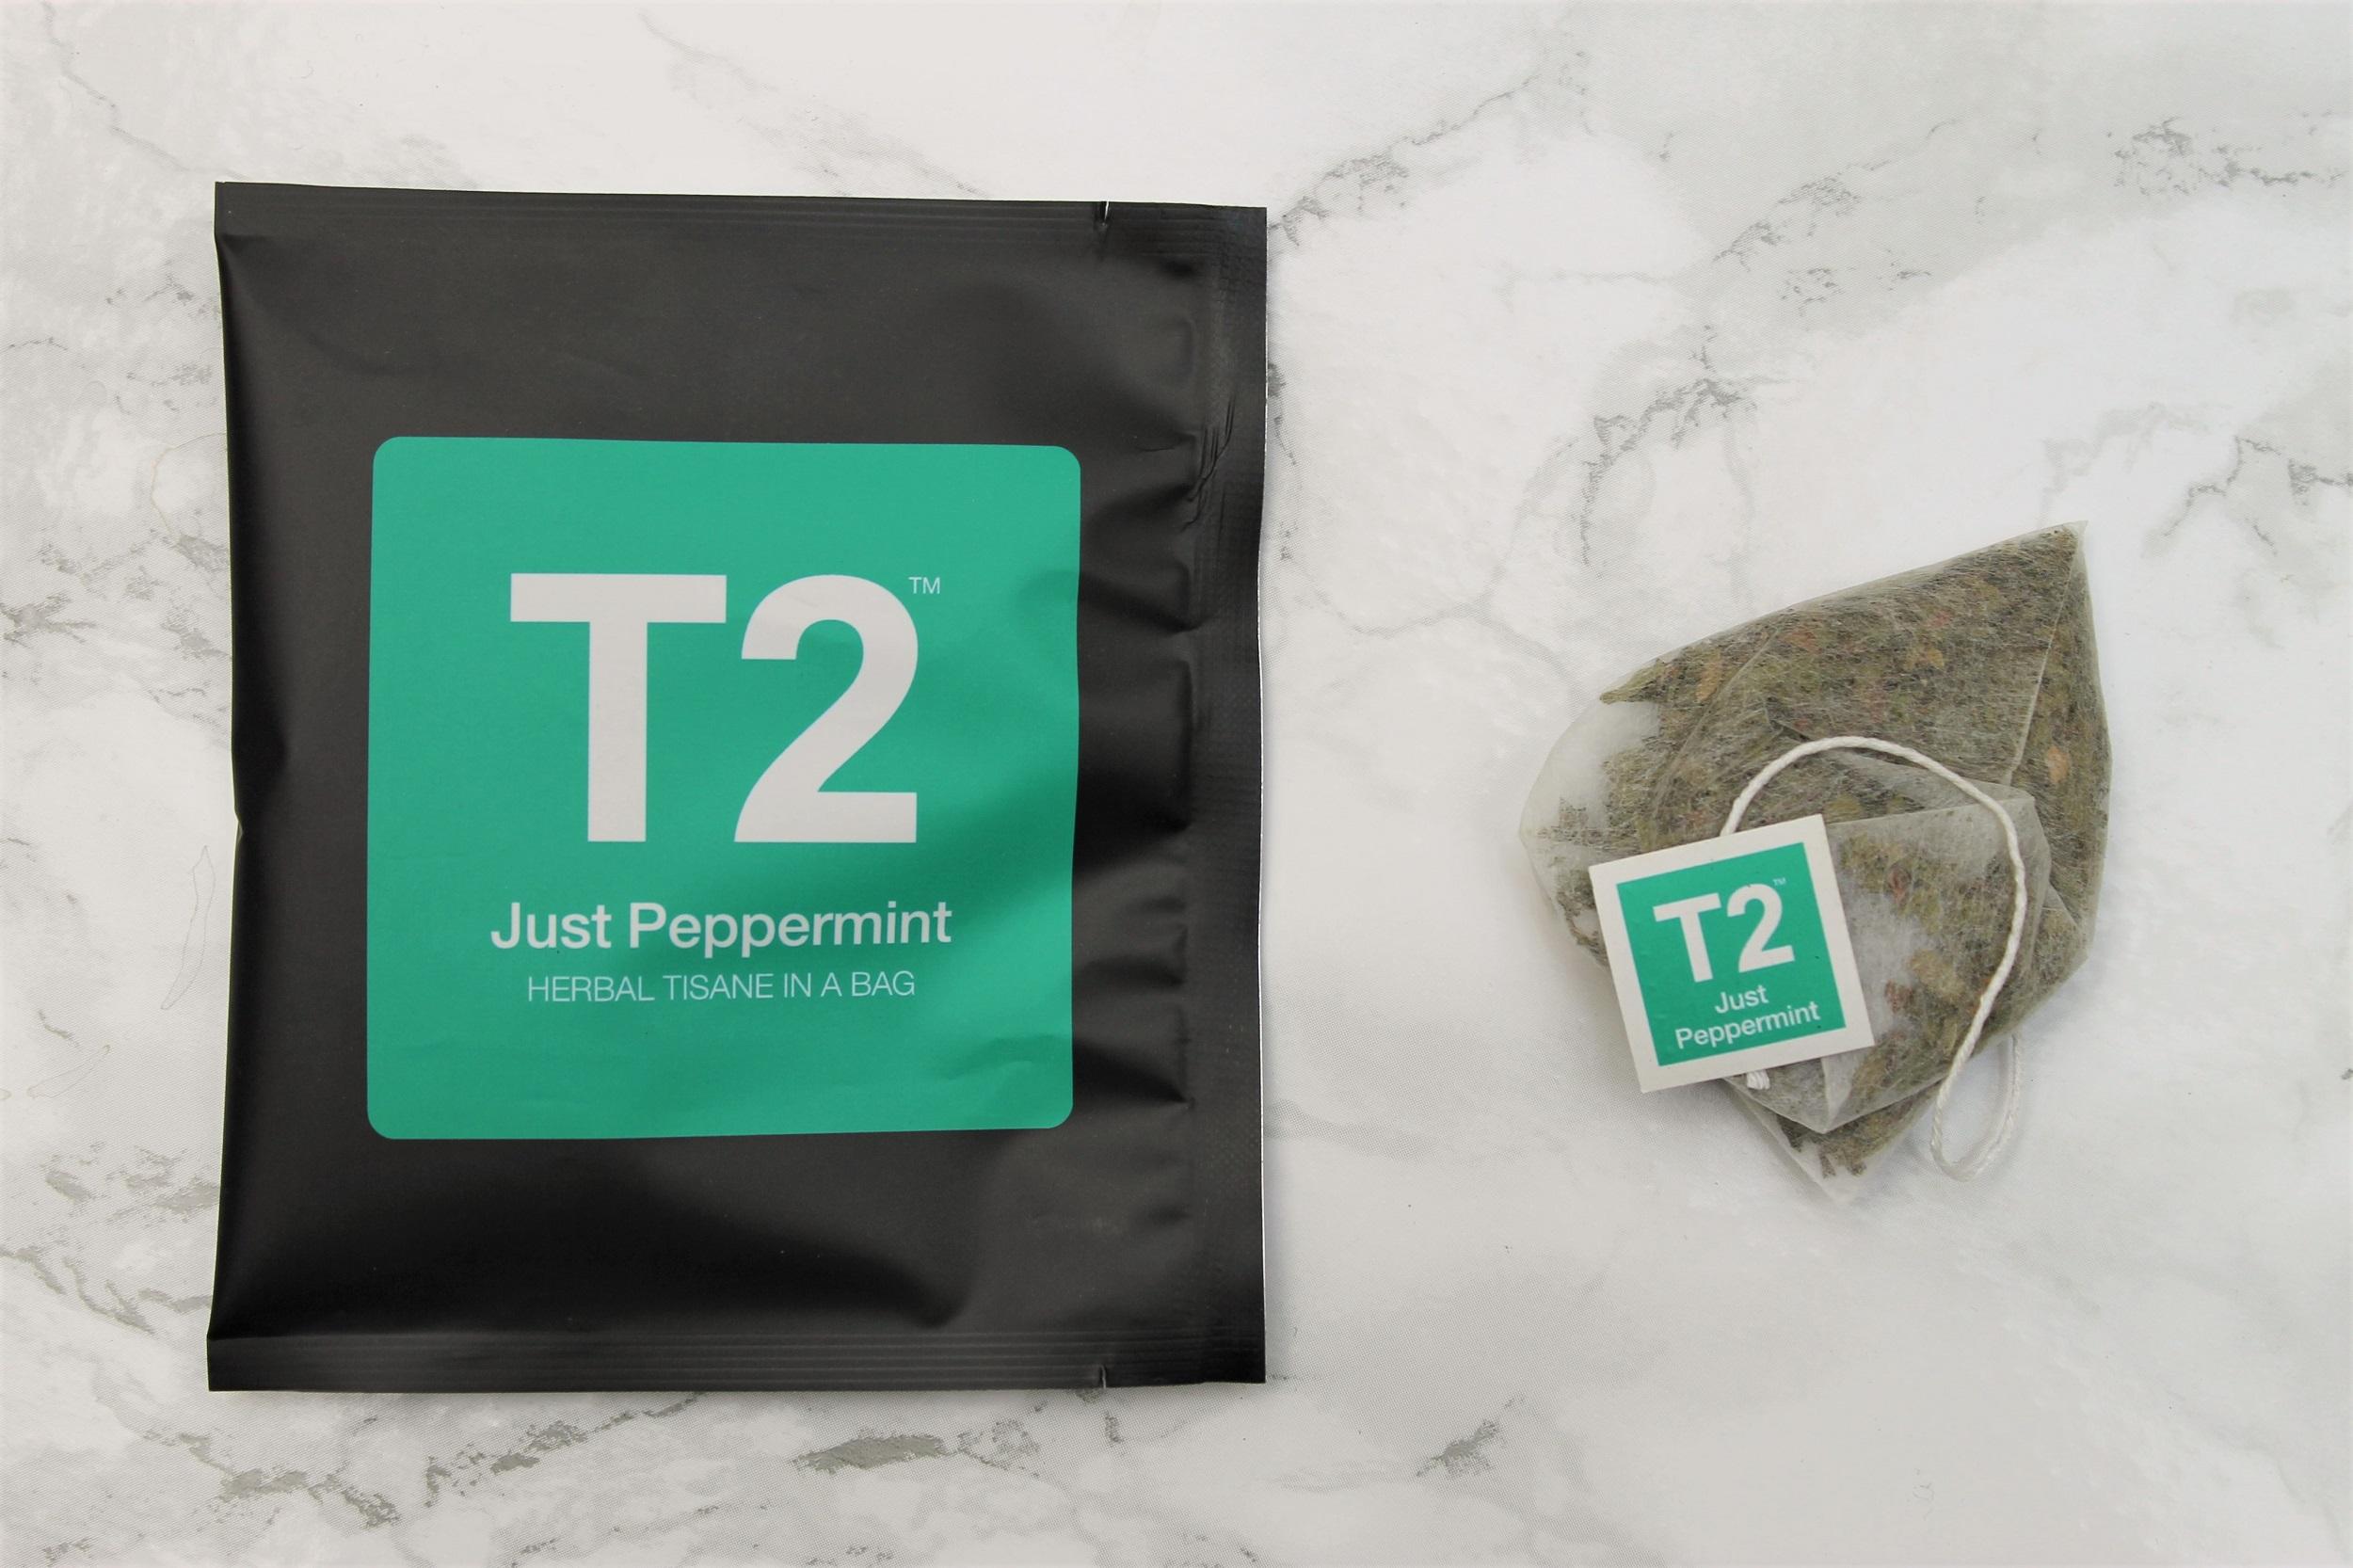 t2 peppermint teabag